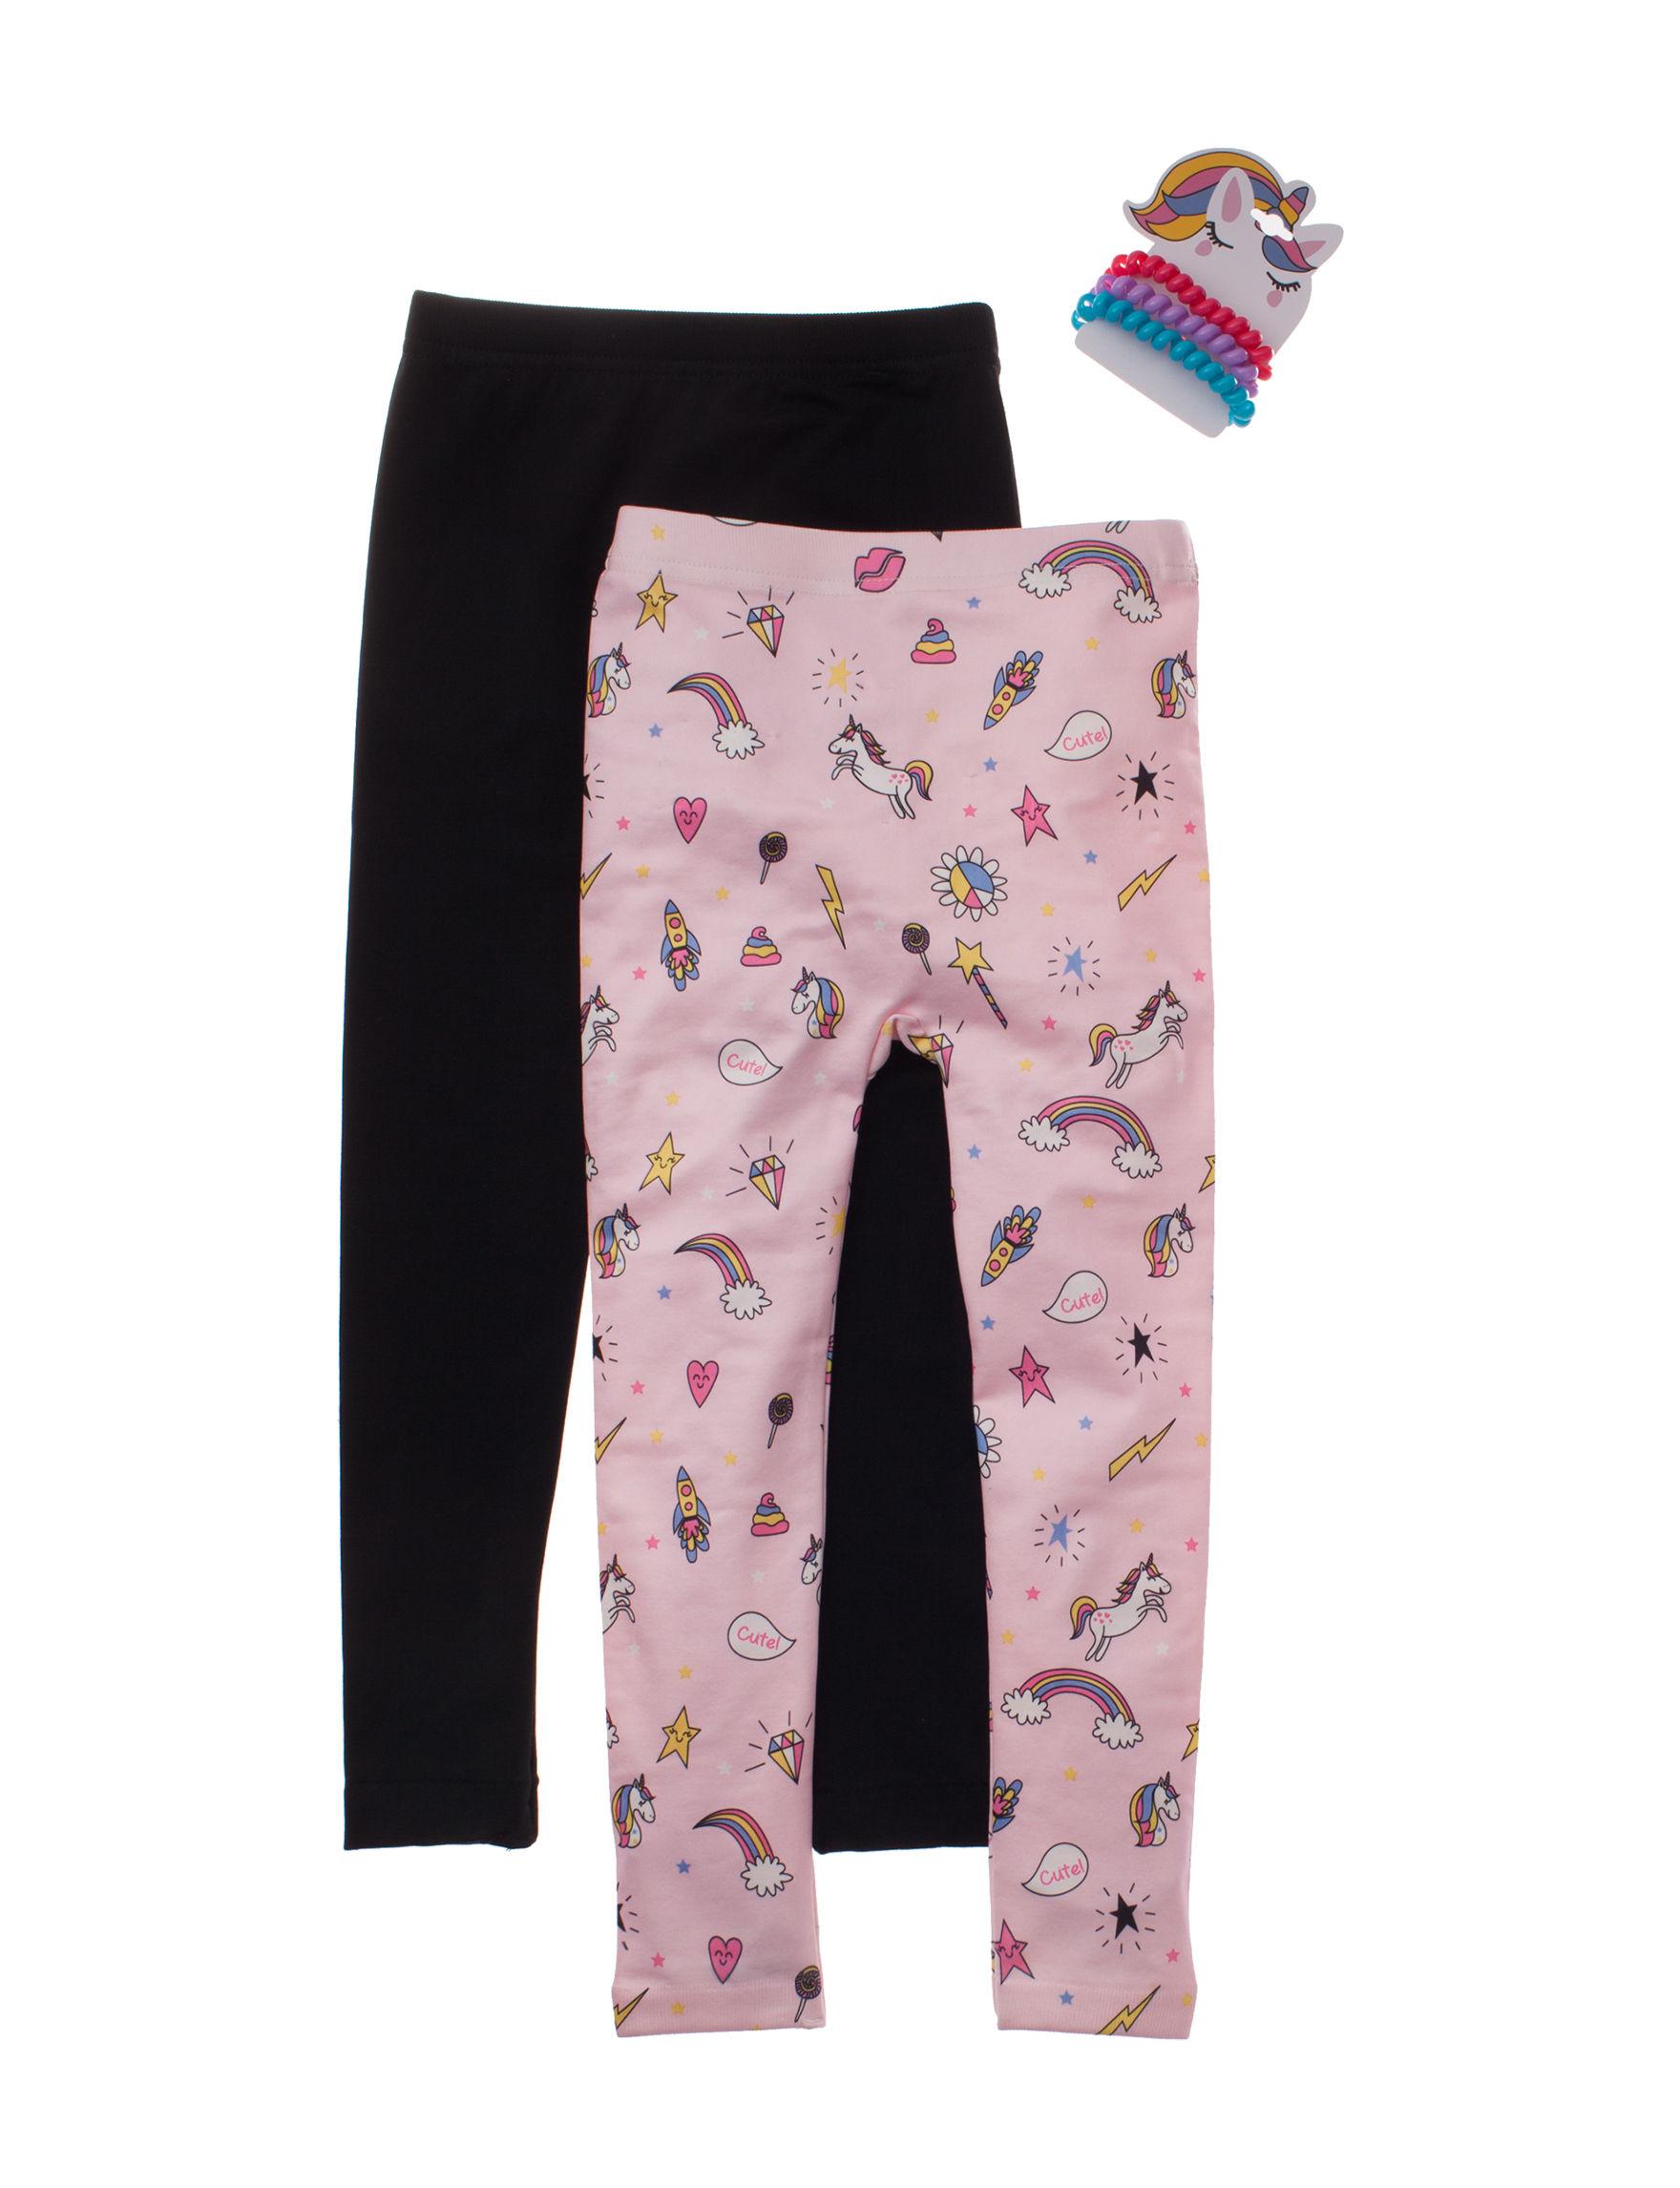 Charlotte Pink Multi Leggings